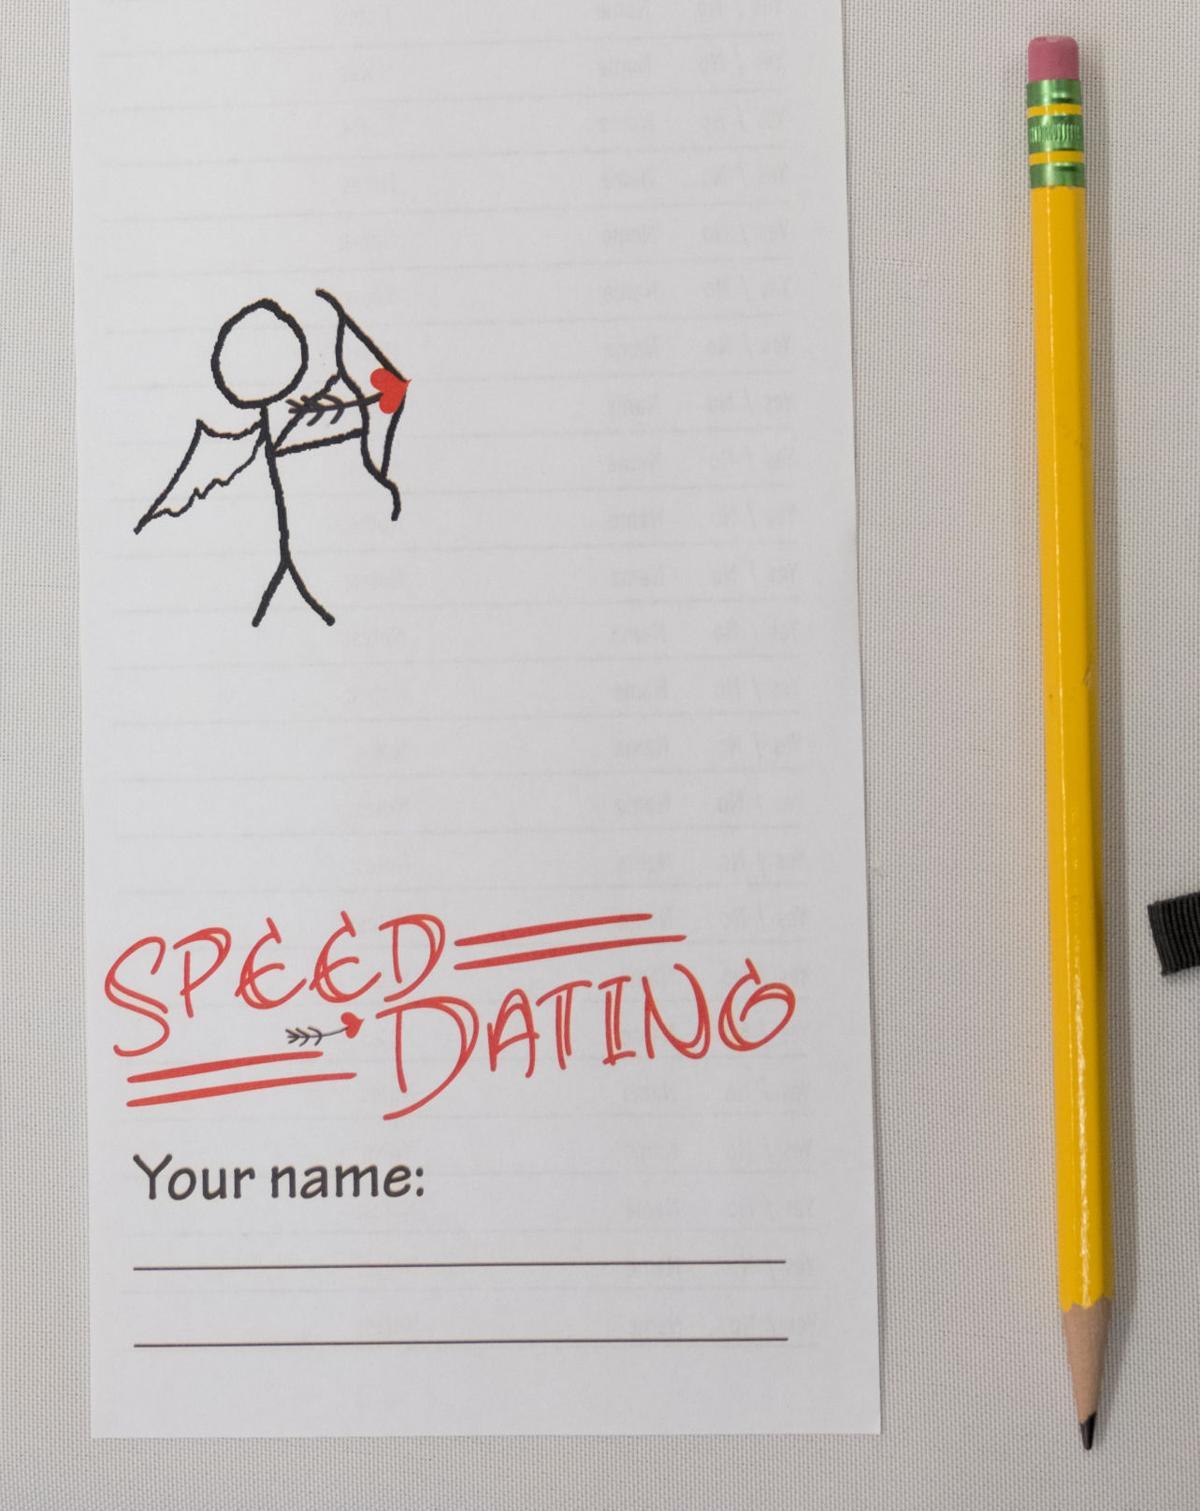 Speed dating vip